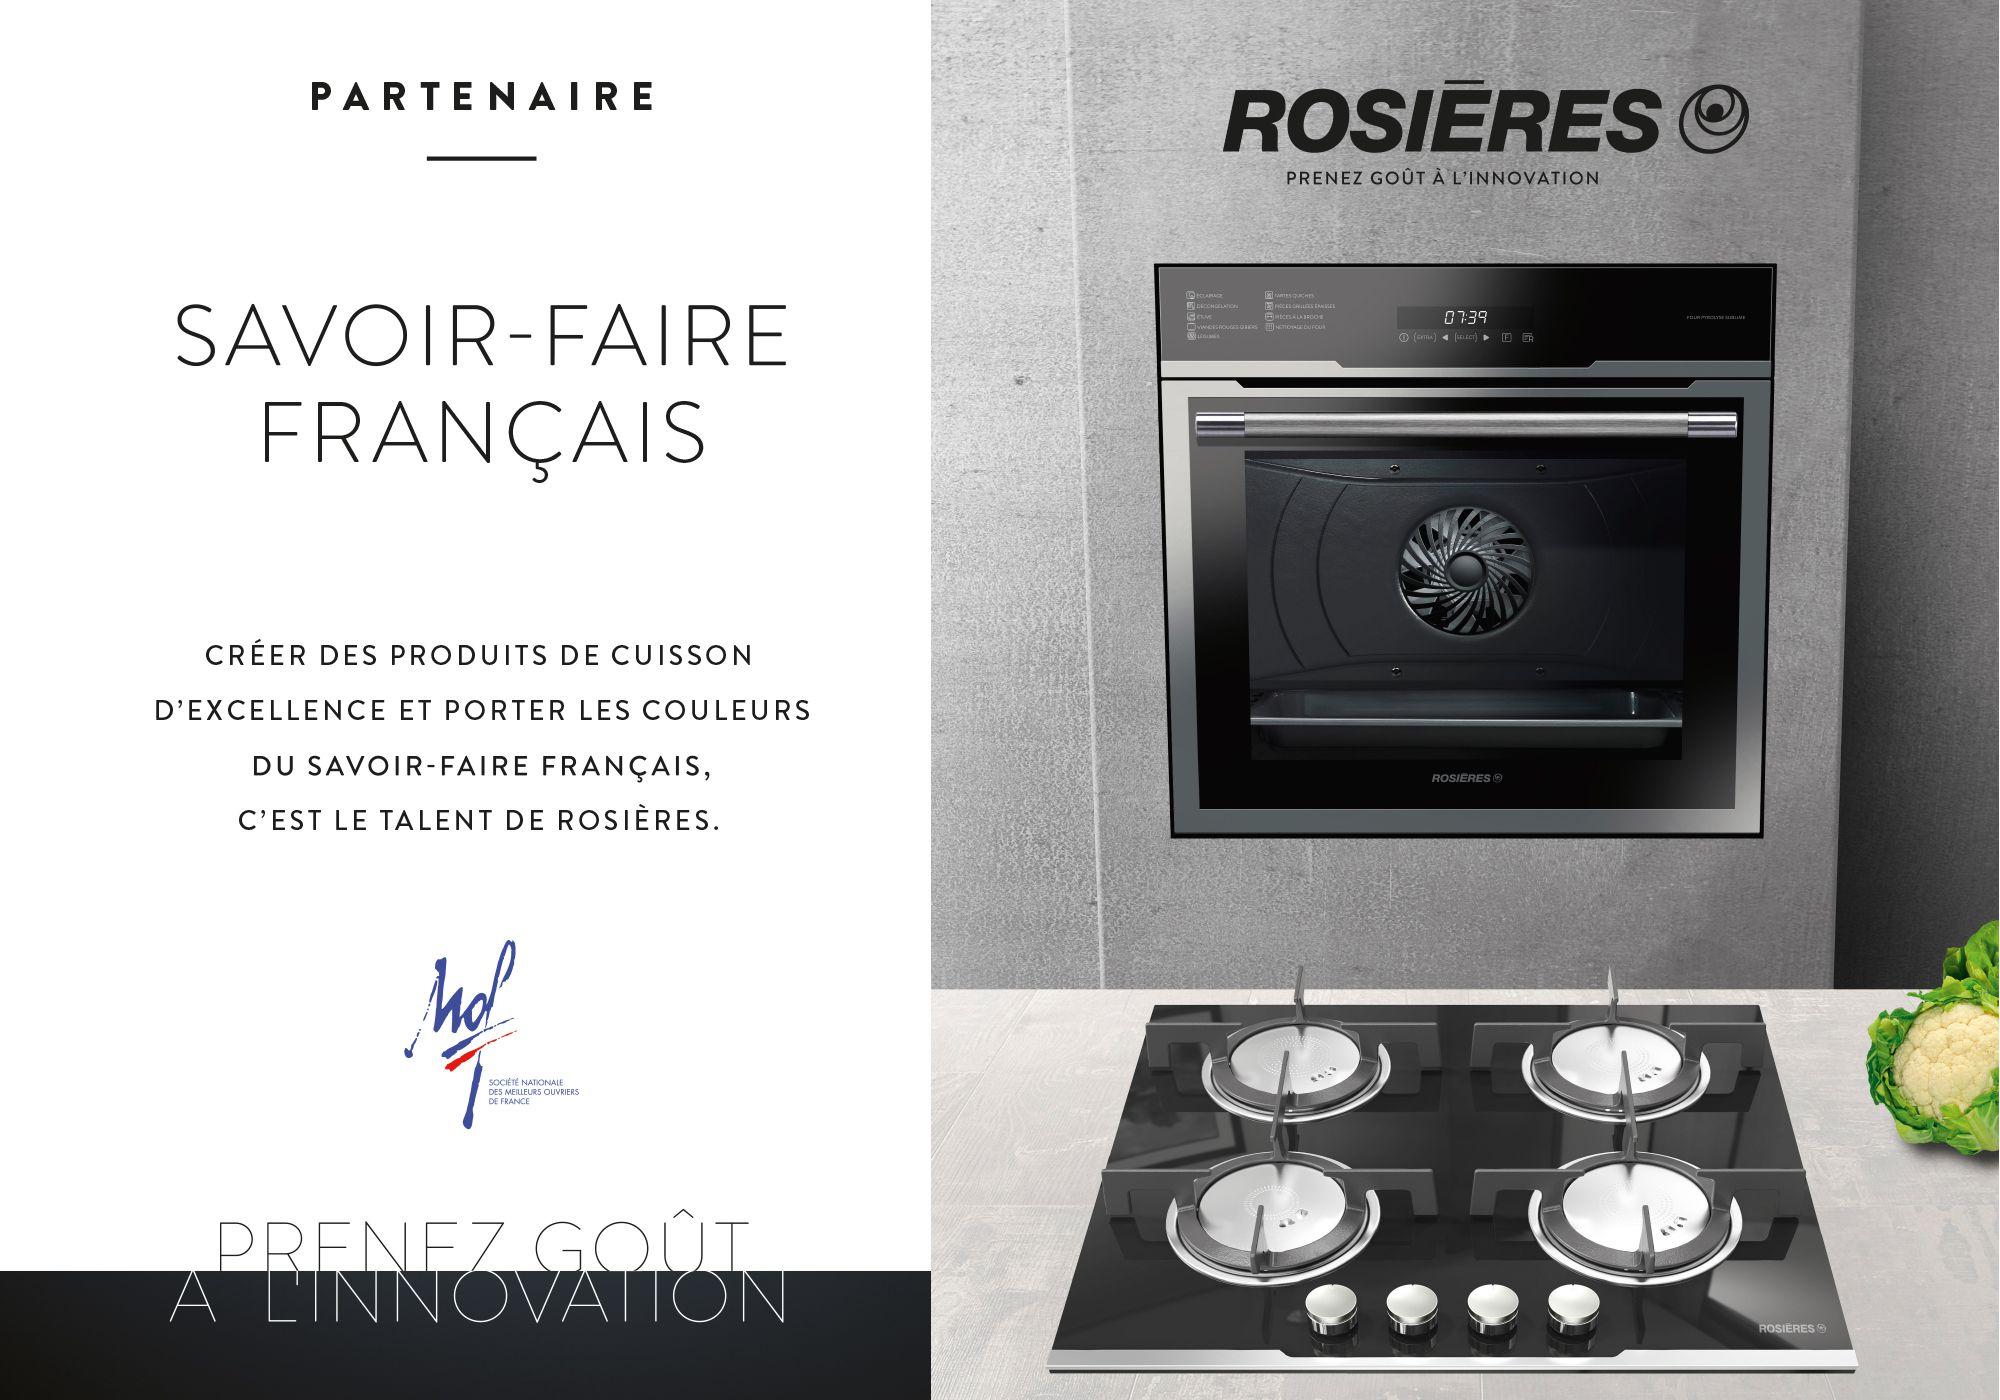 Luminaire Salle De Bain Mr Bricolage ~ promodar quipements de cuisine tunisie salles de bains